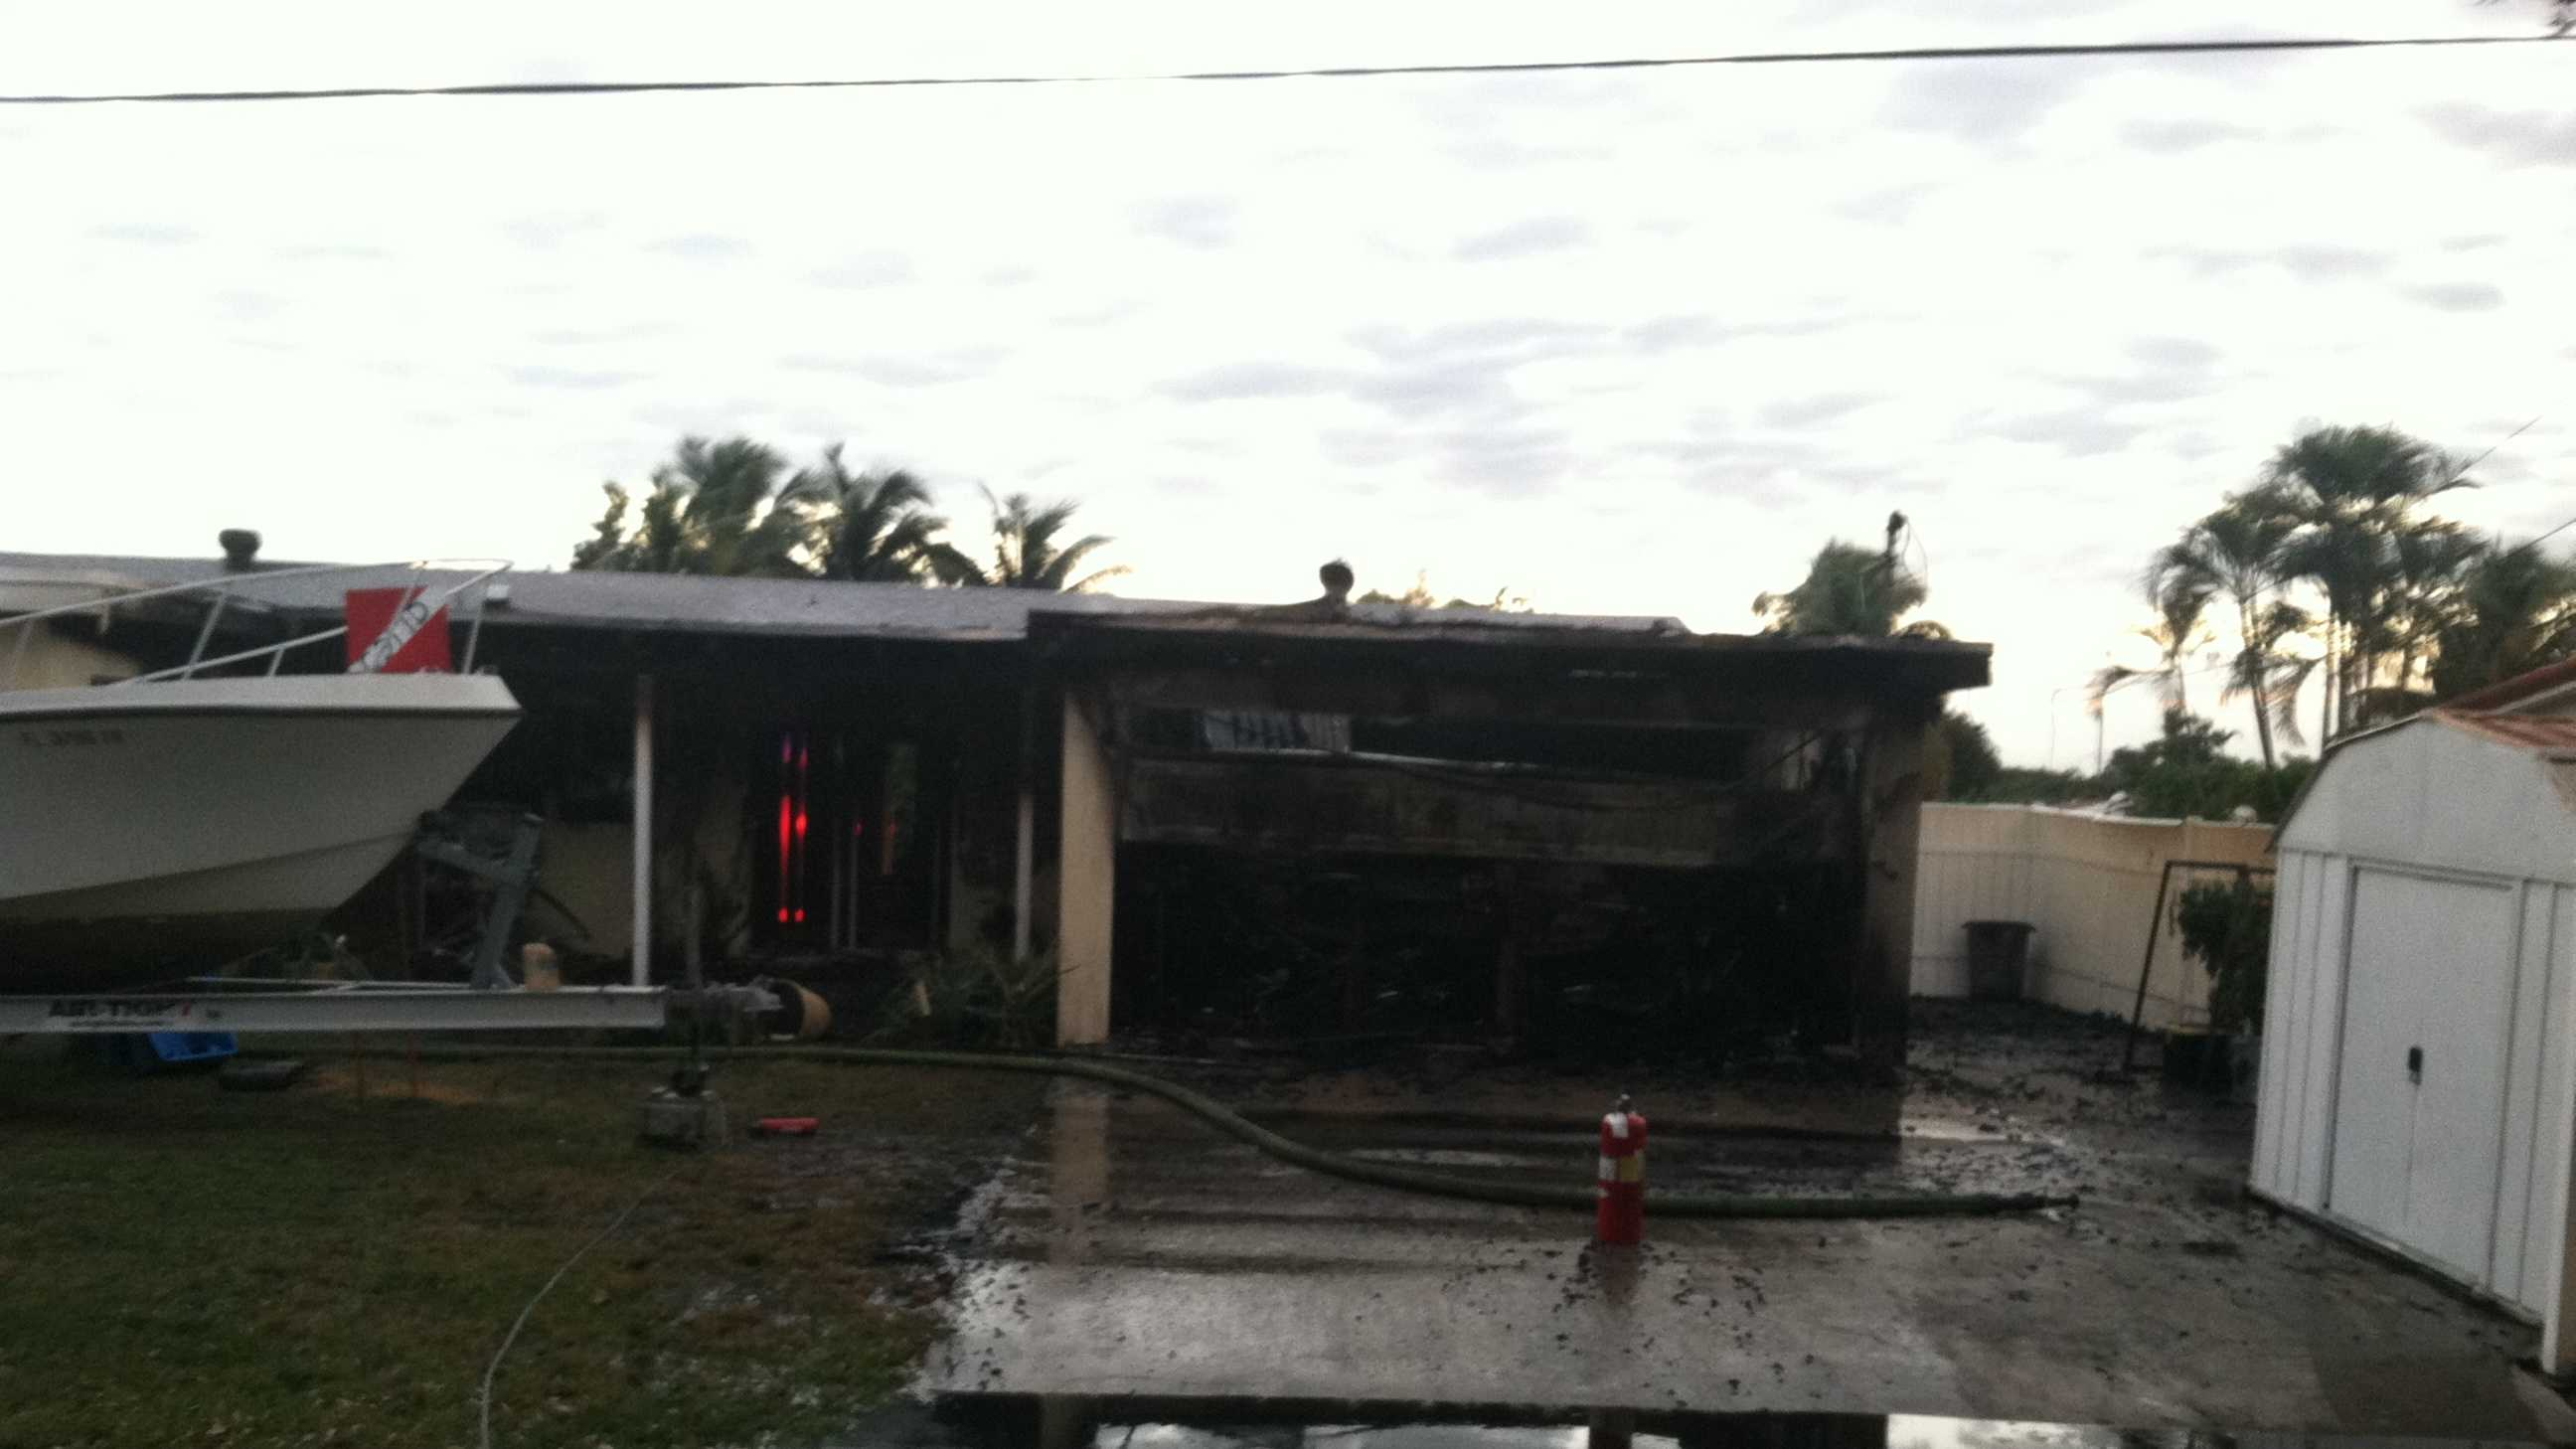 Gardens fire house damage